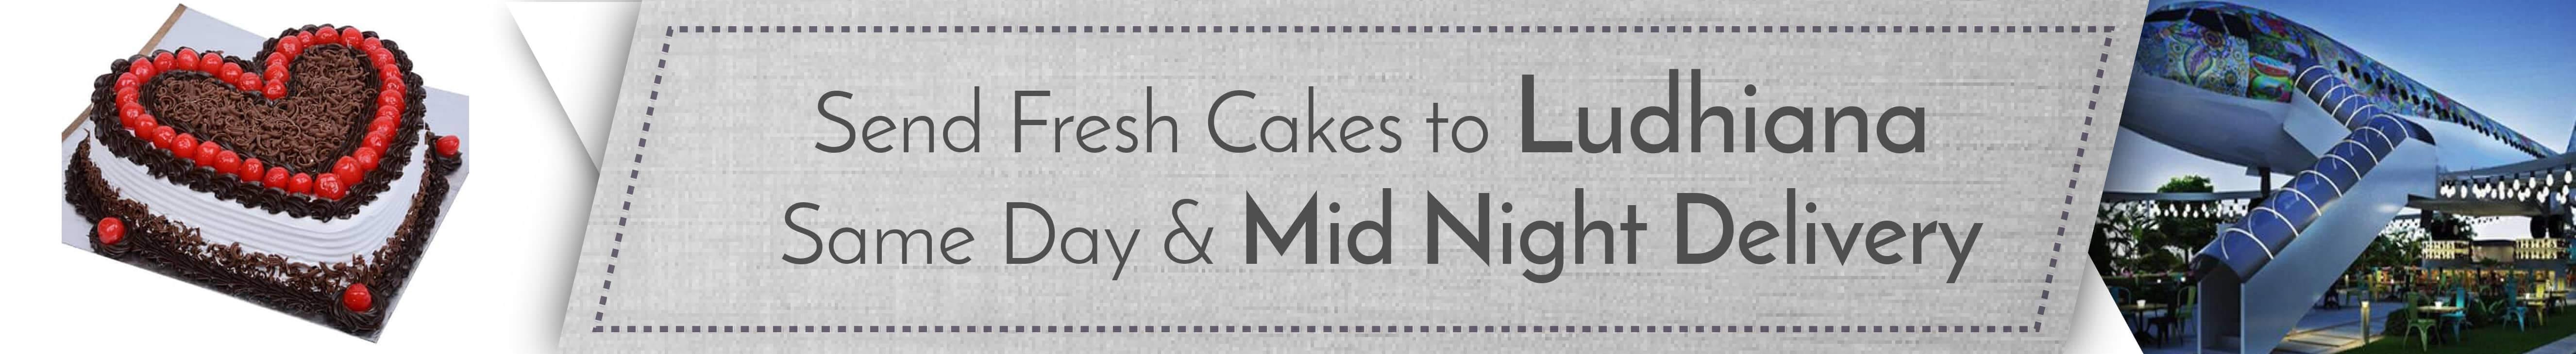 Cakes Ludhiana